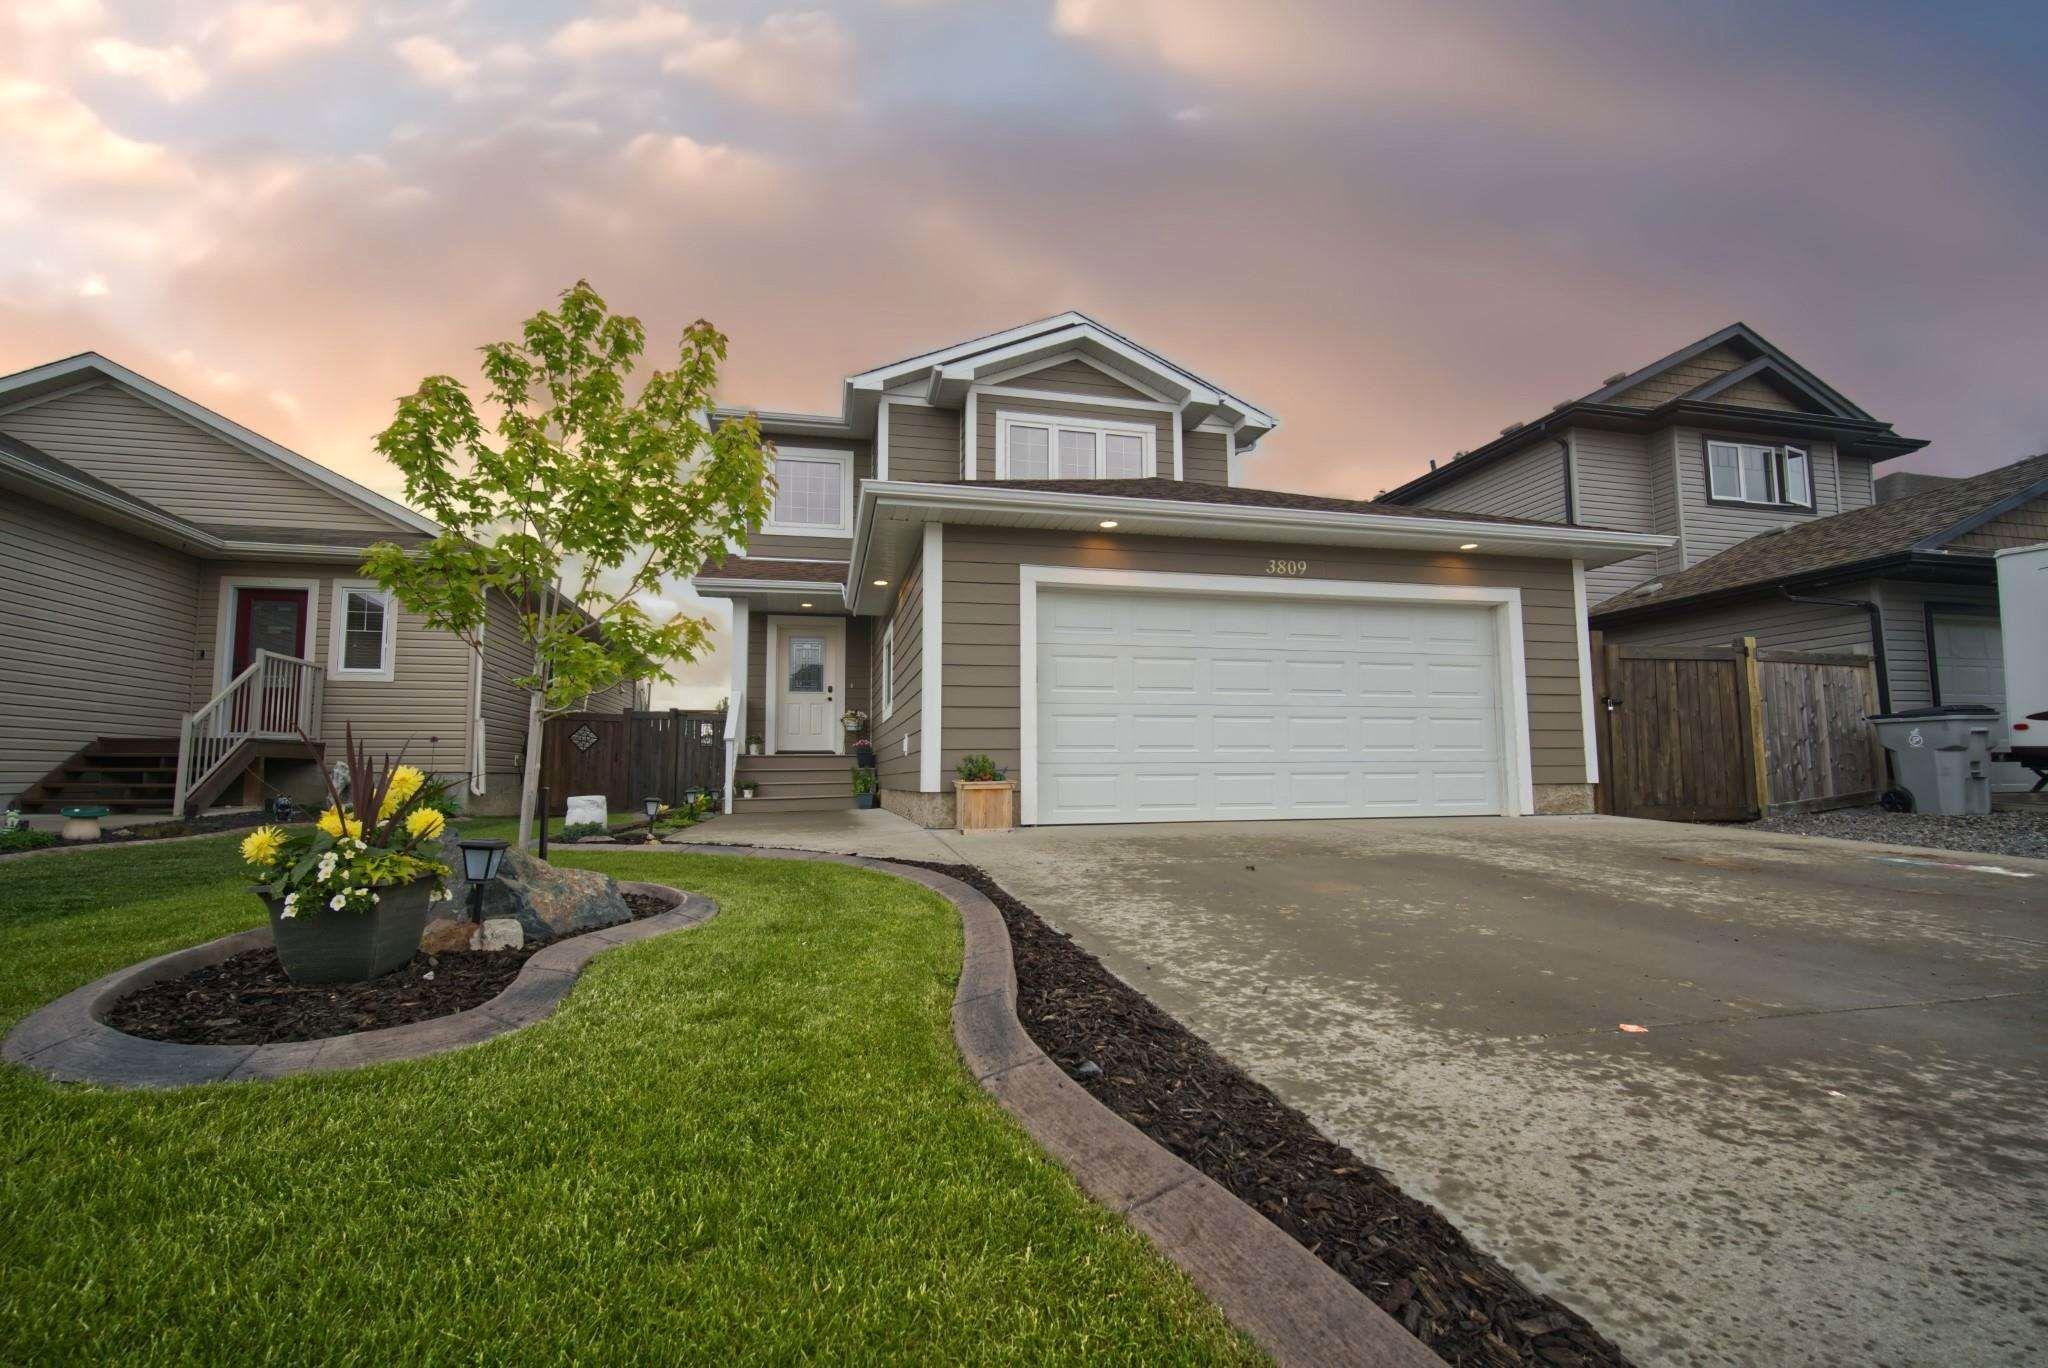 Main Photo: 3809 52 Street: Gibbons House for sale : MLS®# E4249038